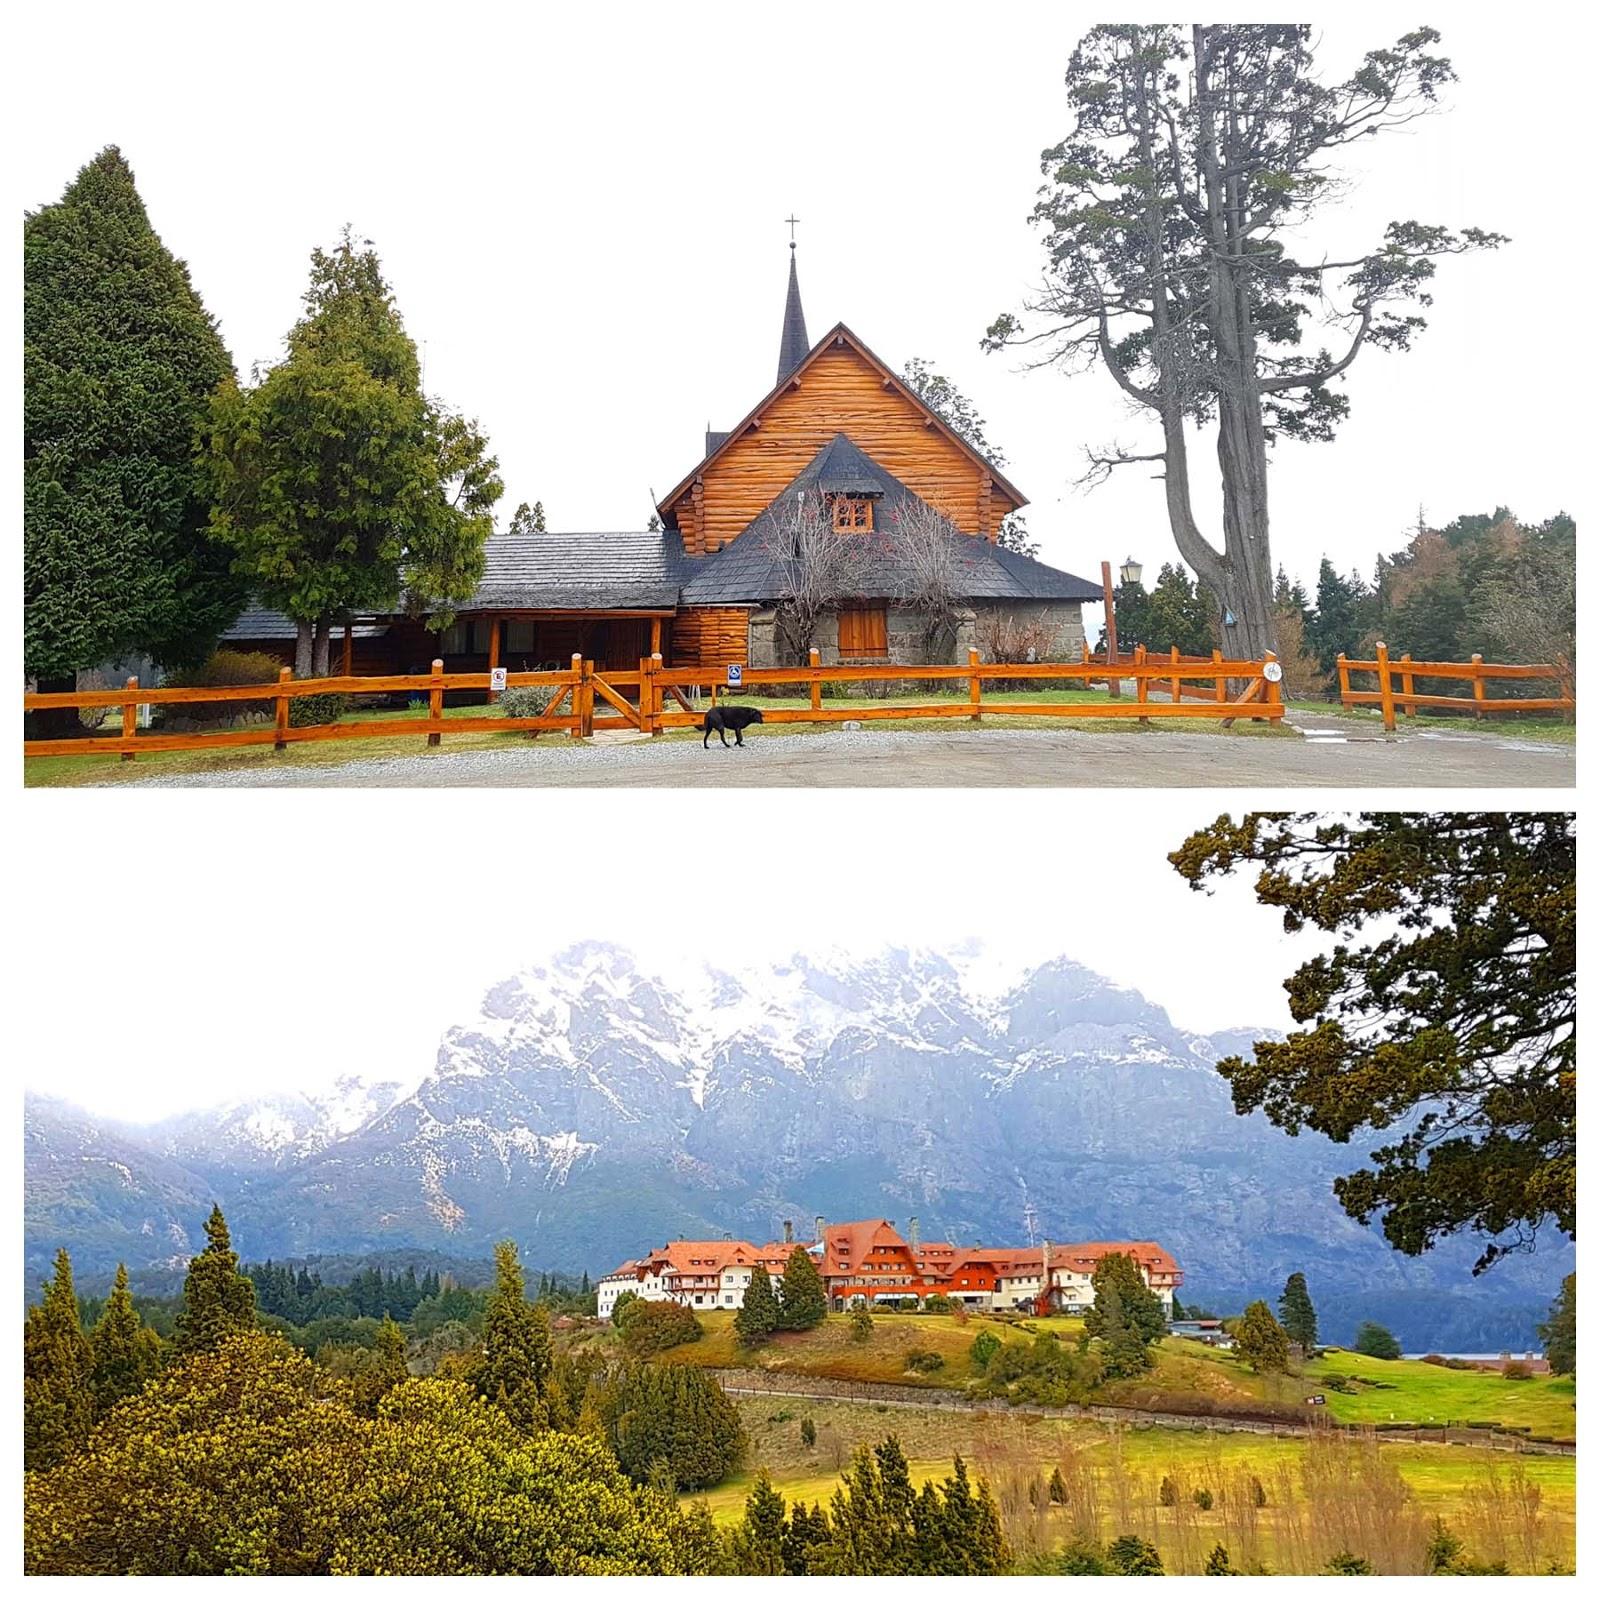 Roteiro Patagônia Argentina :Bariloche, Villa la Angostura, San Martin de los Andes